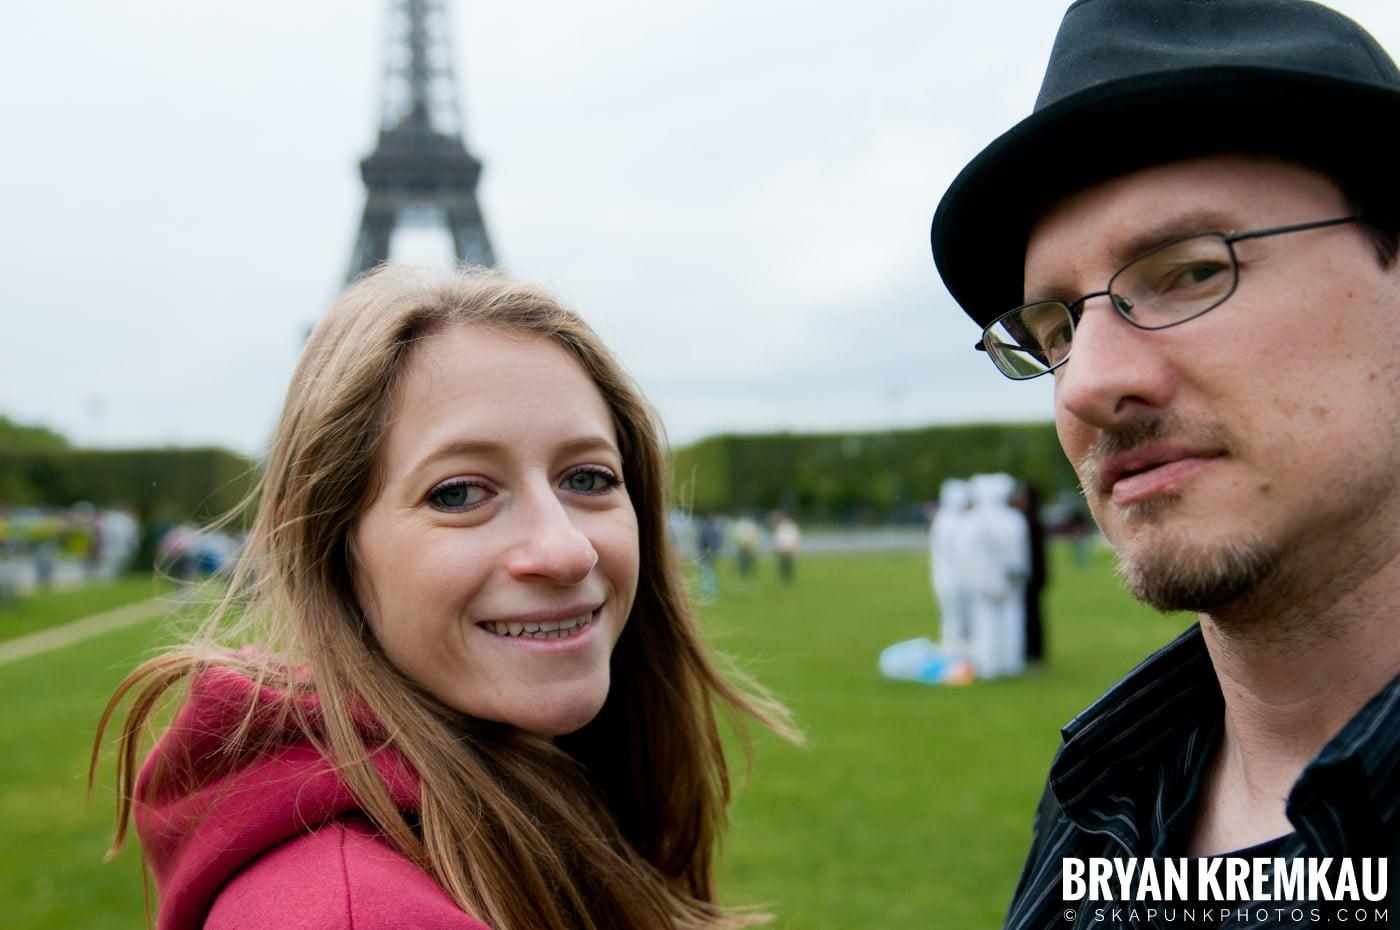 Paris, France Honeymoon - Day 3 - 7.20.11 (3)